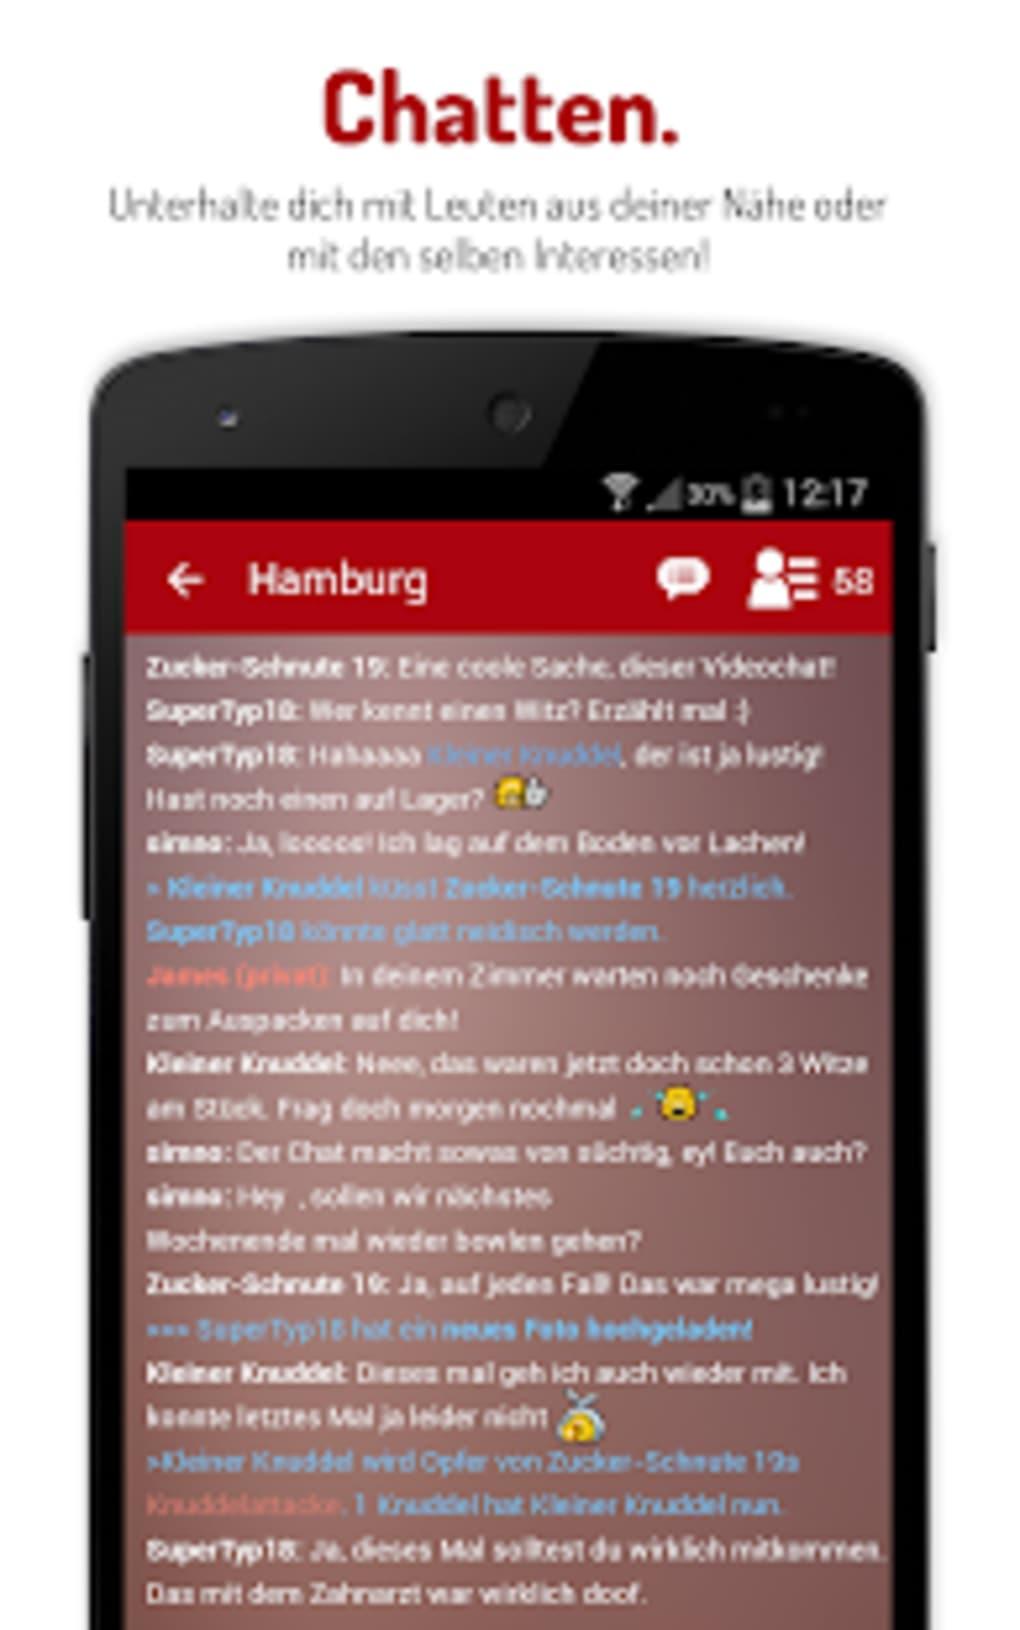 Knuddels - Chat. Play. Flirt. APK für Android - Download